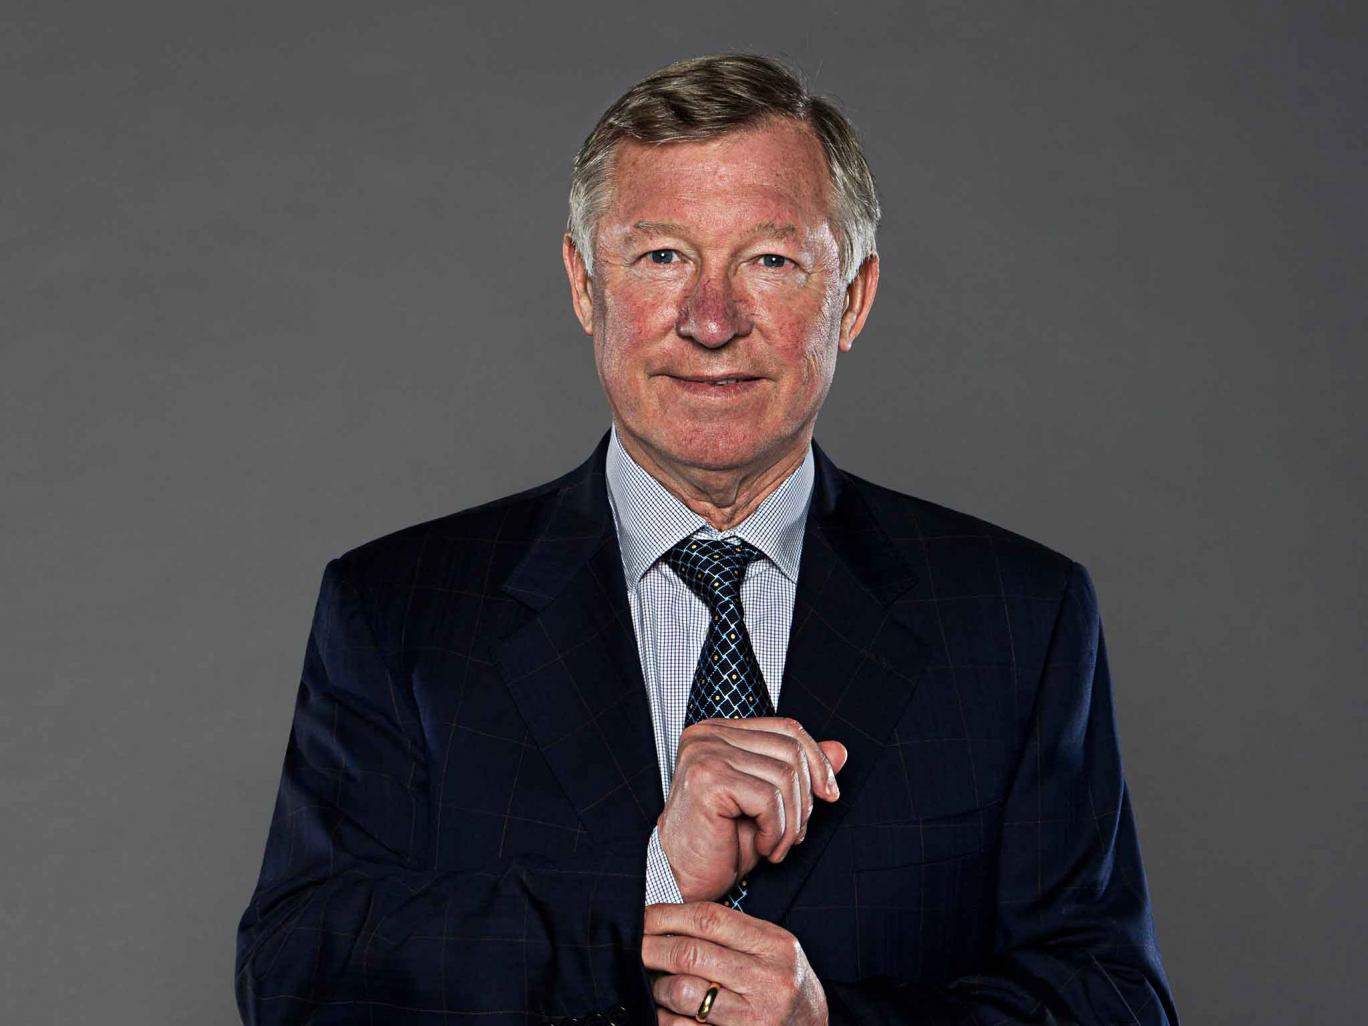 6 Fakta Unik yang Belum Kamu Ketahui Tentang Sir Alex Ferguson!